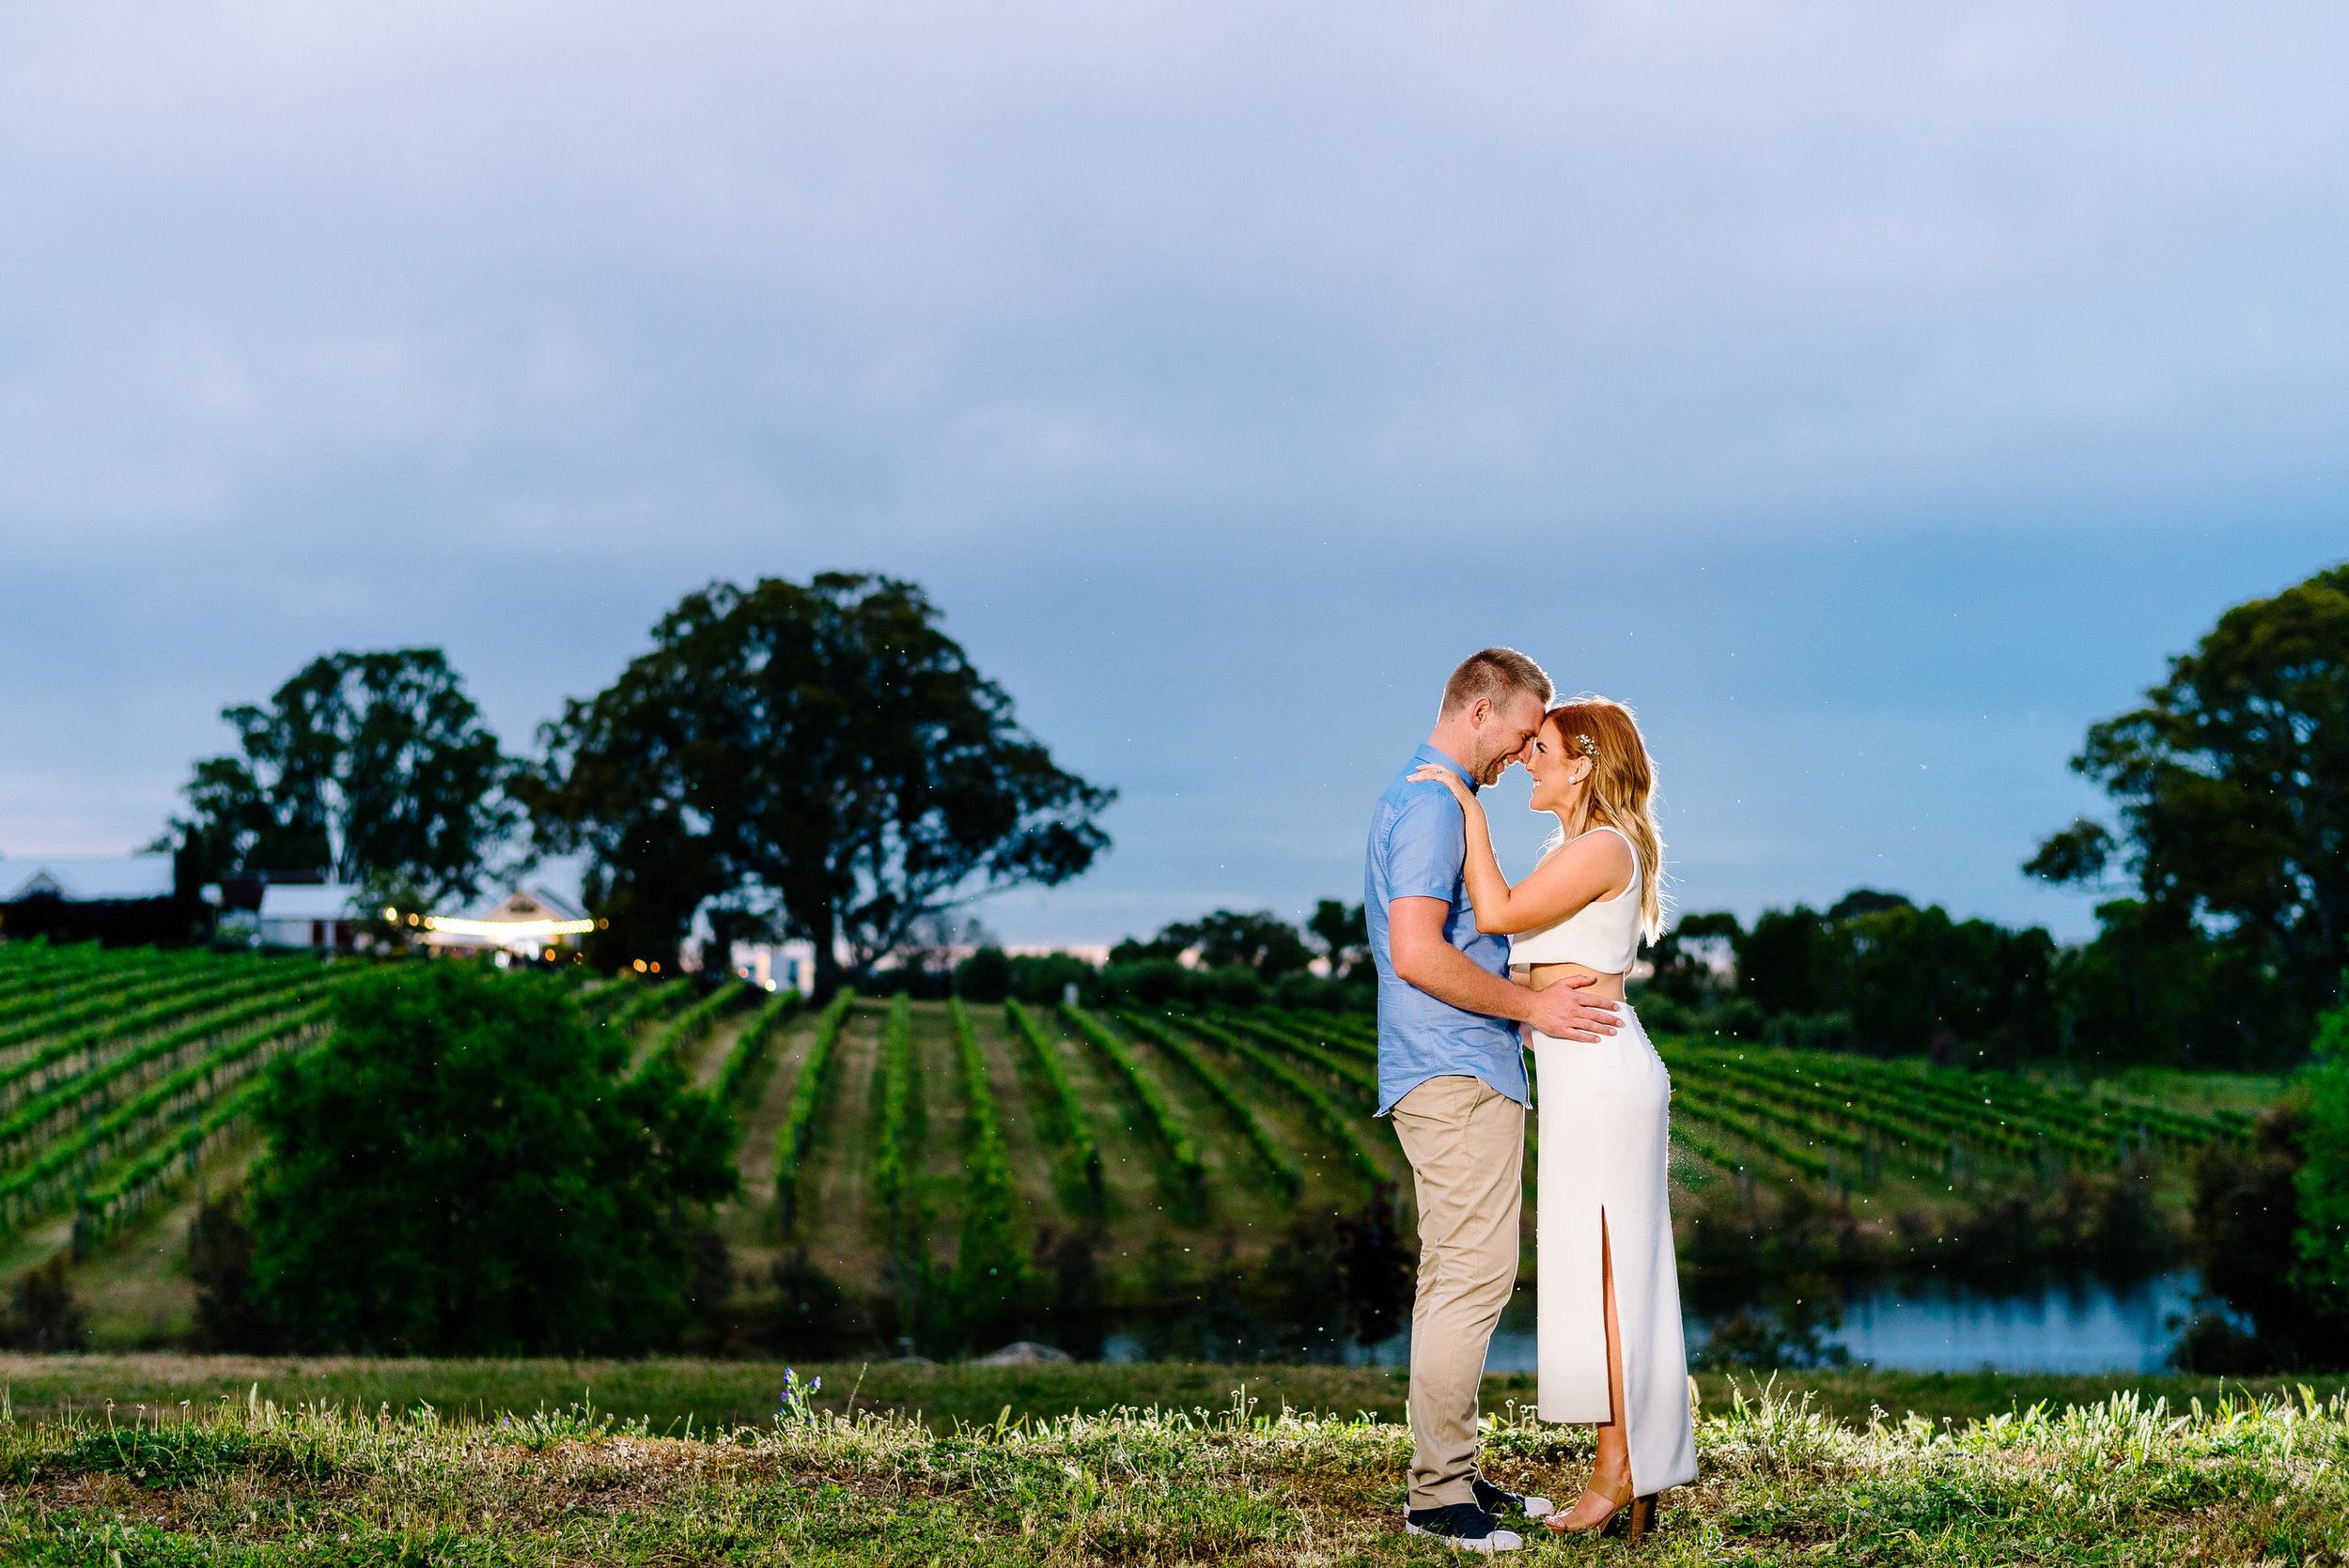 Bendigo_Wedding_Photography_Justin_Jim_BelvoirPark-264.JPG